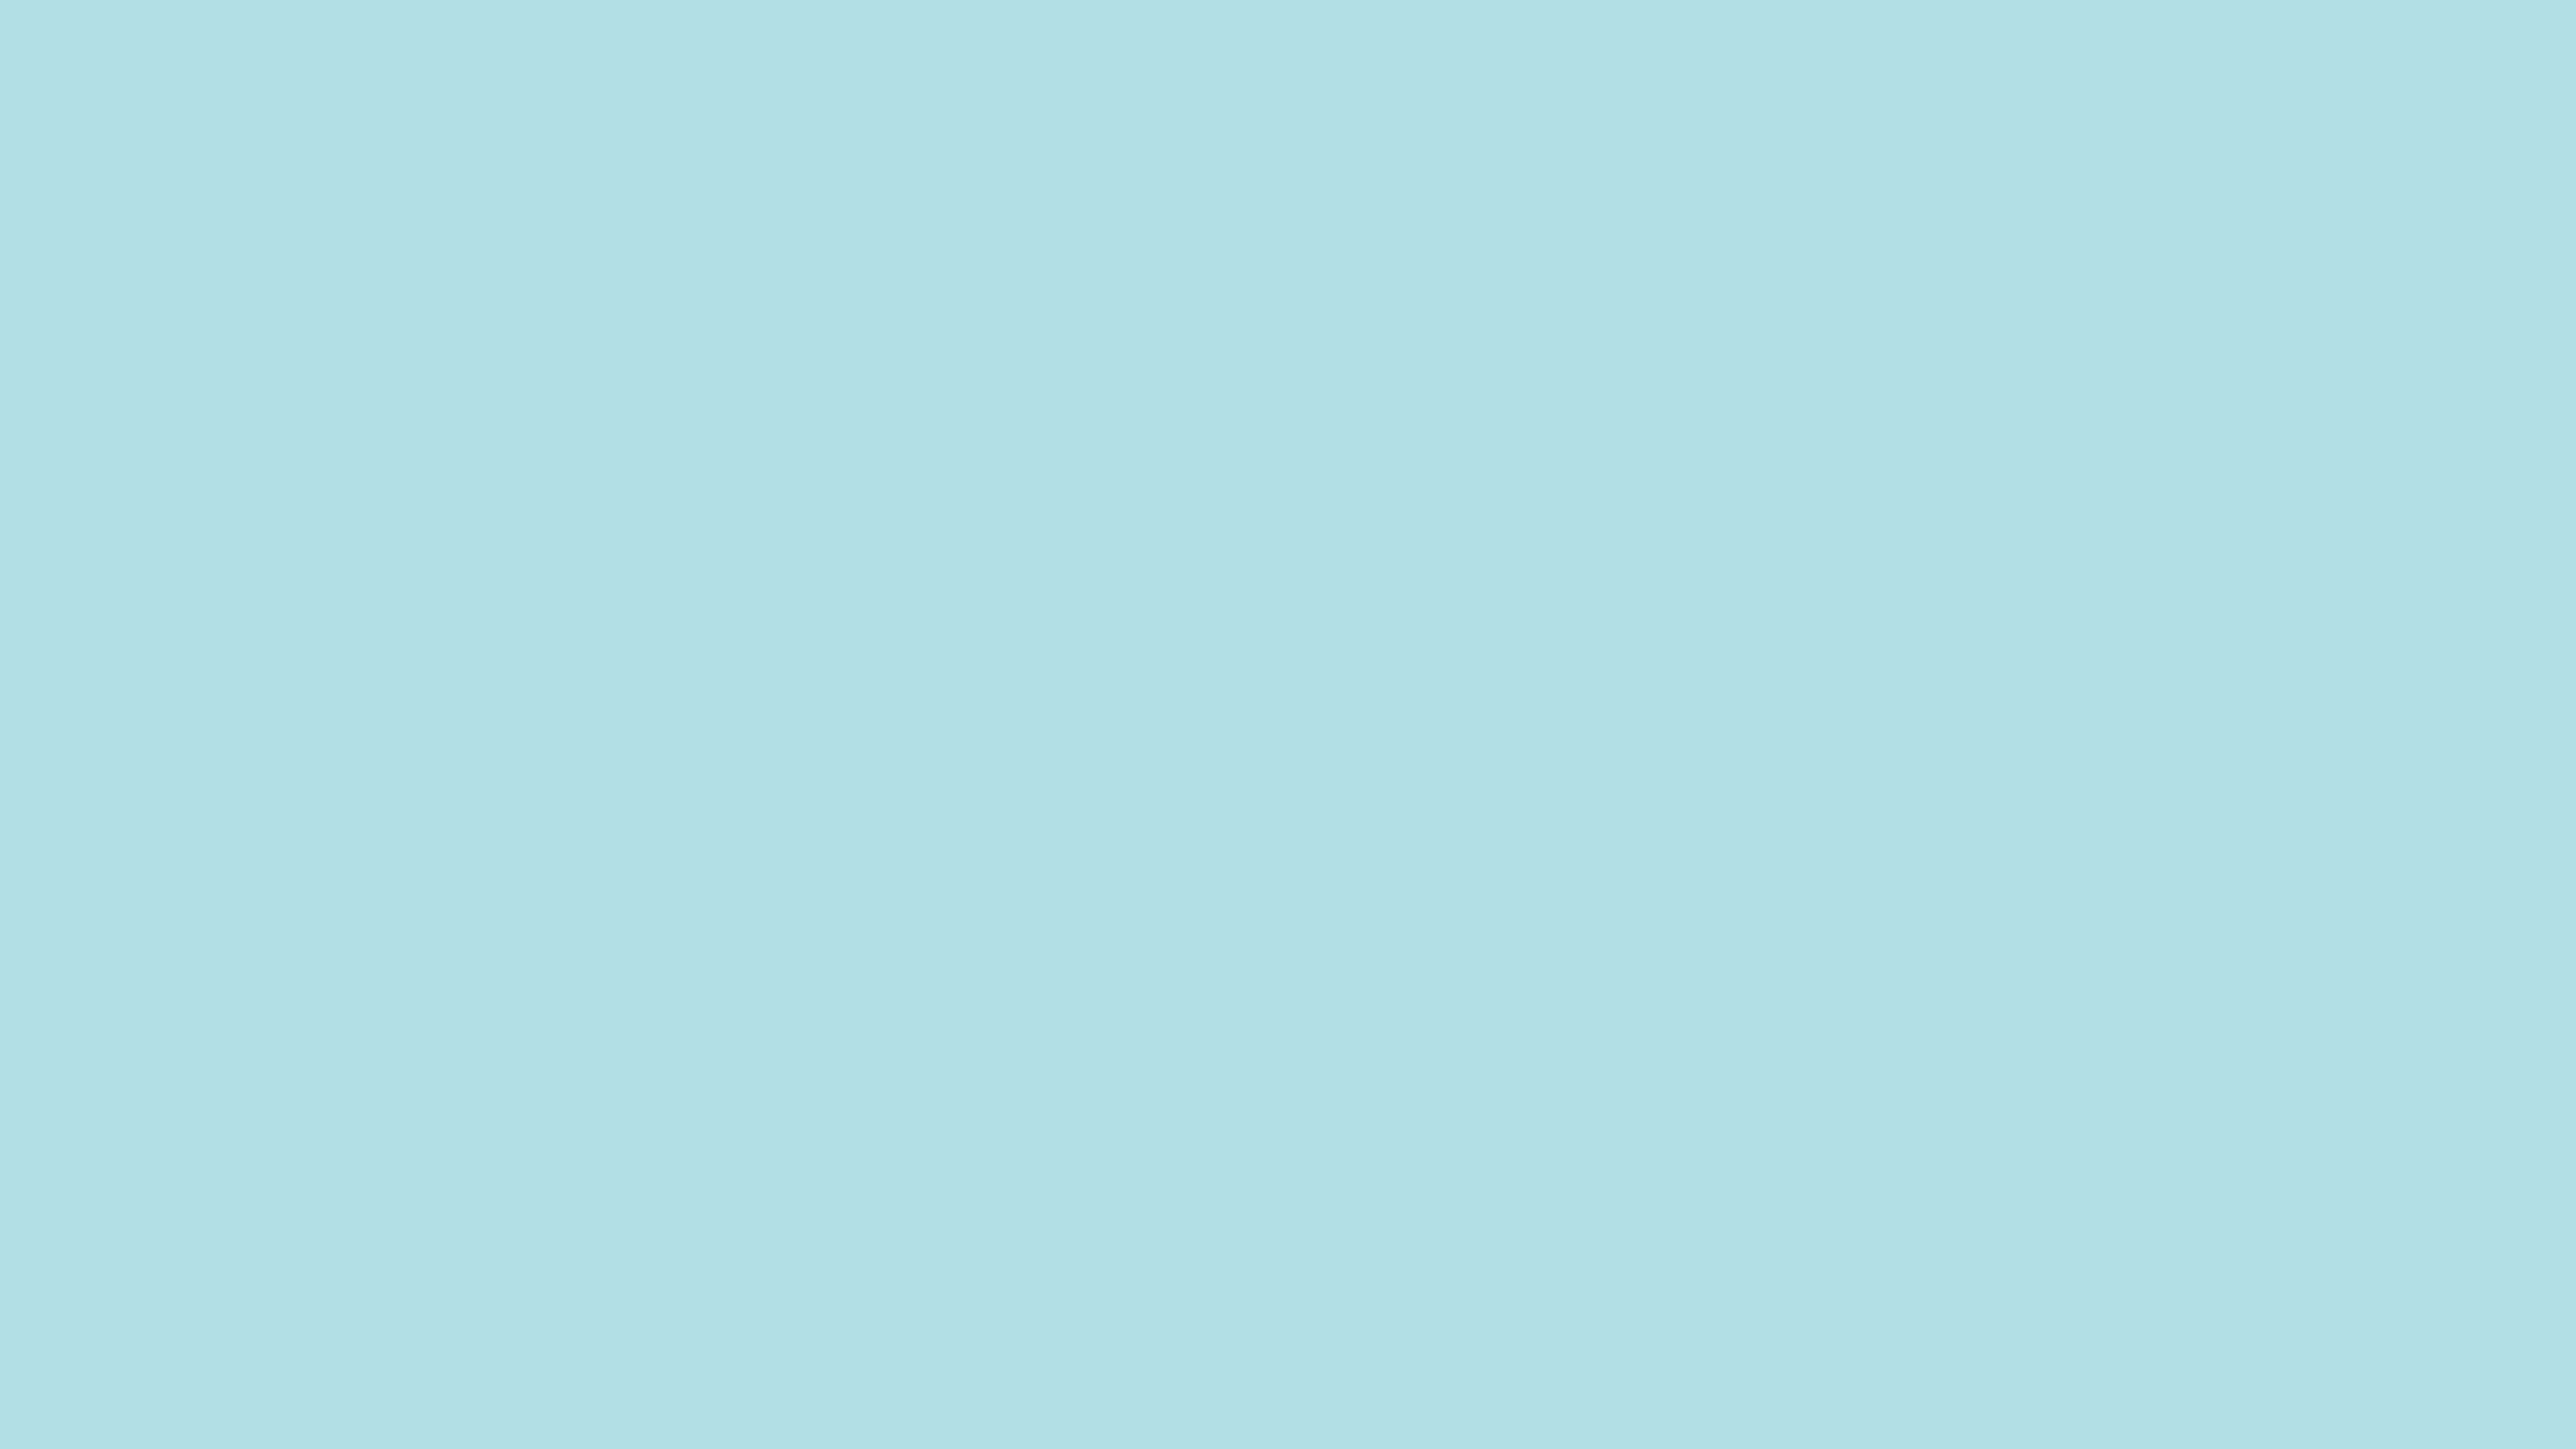 7680x4320 Powder Blue Web Solid Color Background